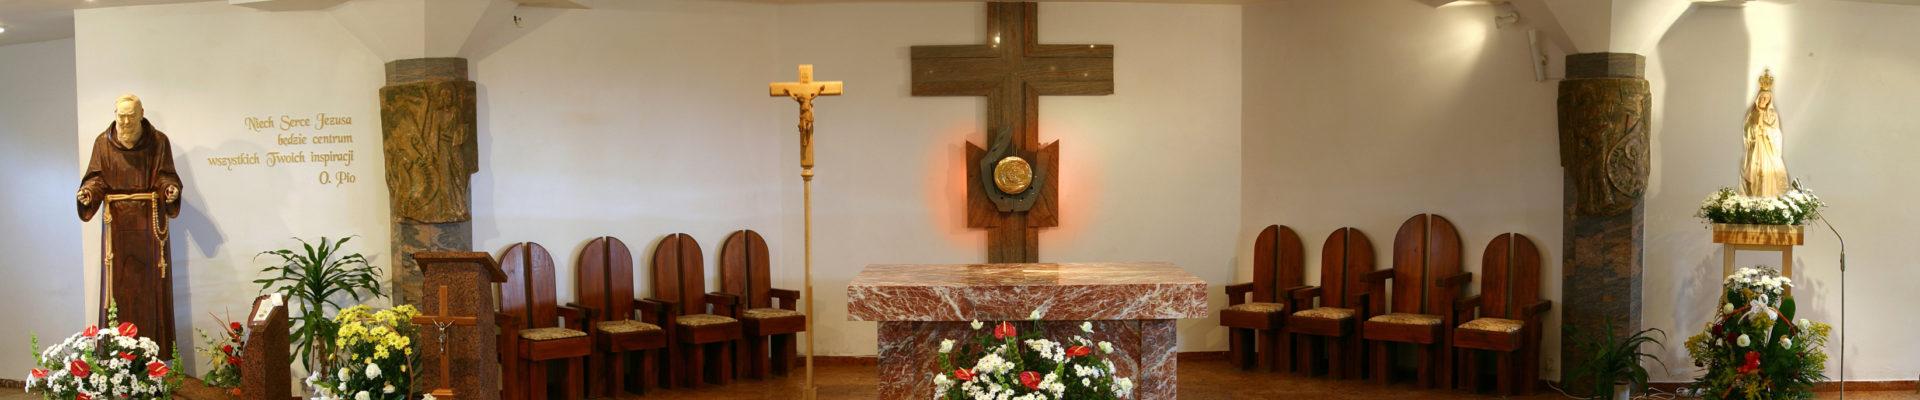 Sanktuarium Świętego Ojca Pio